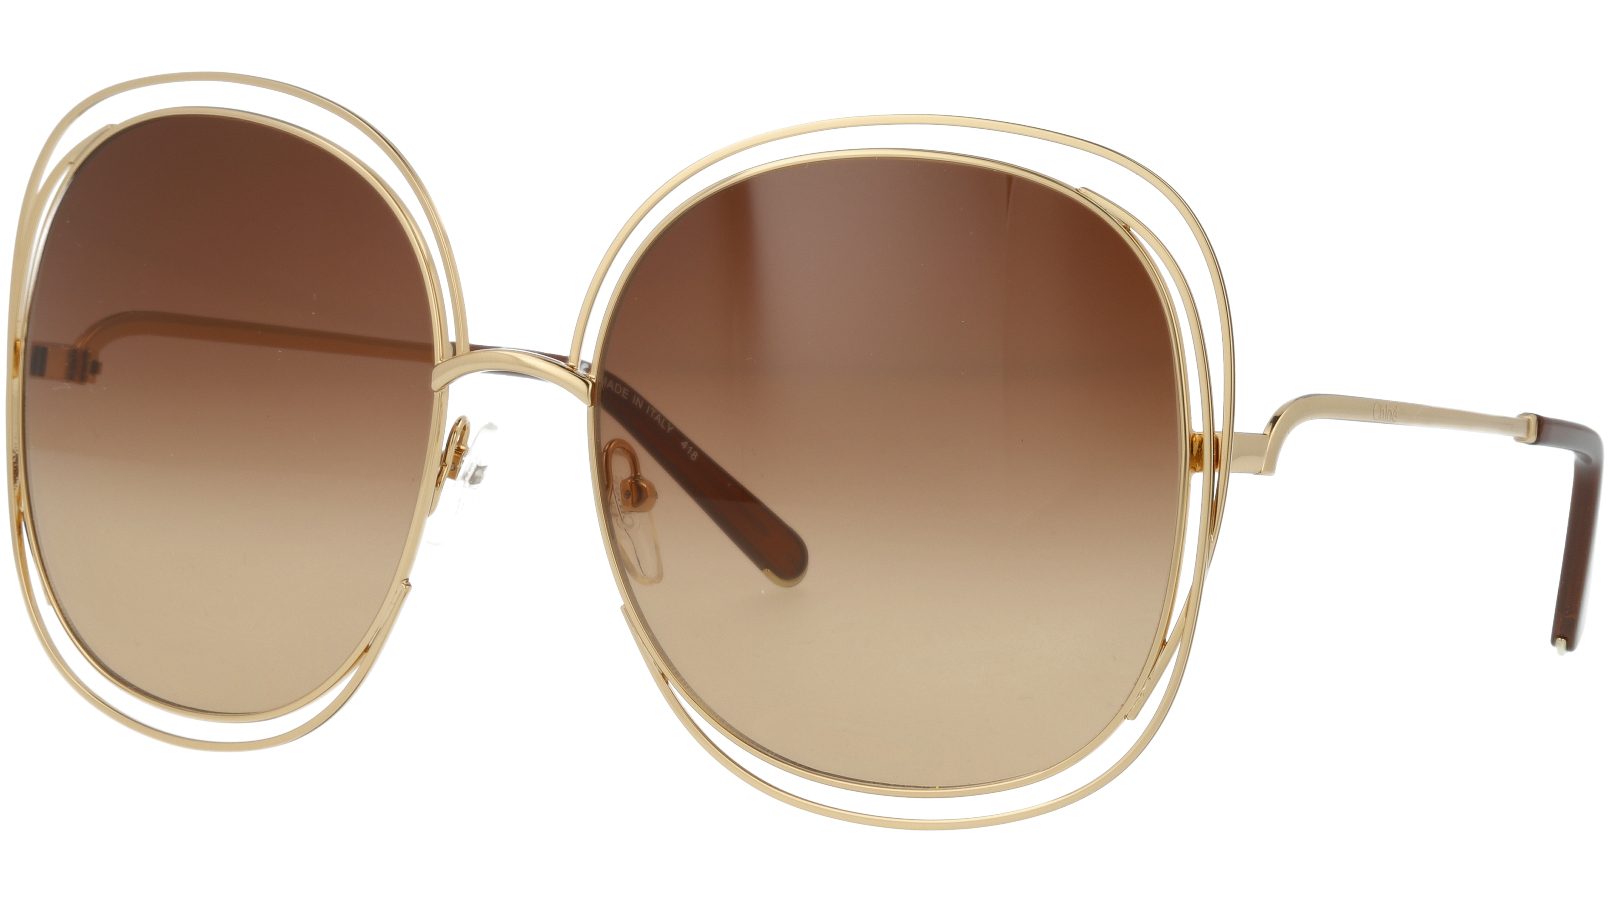 CHLOE CE126S 724 62 Gold/Transparent Peach Carlina Sunglasses